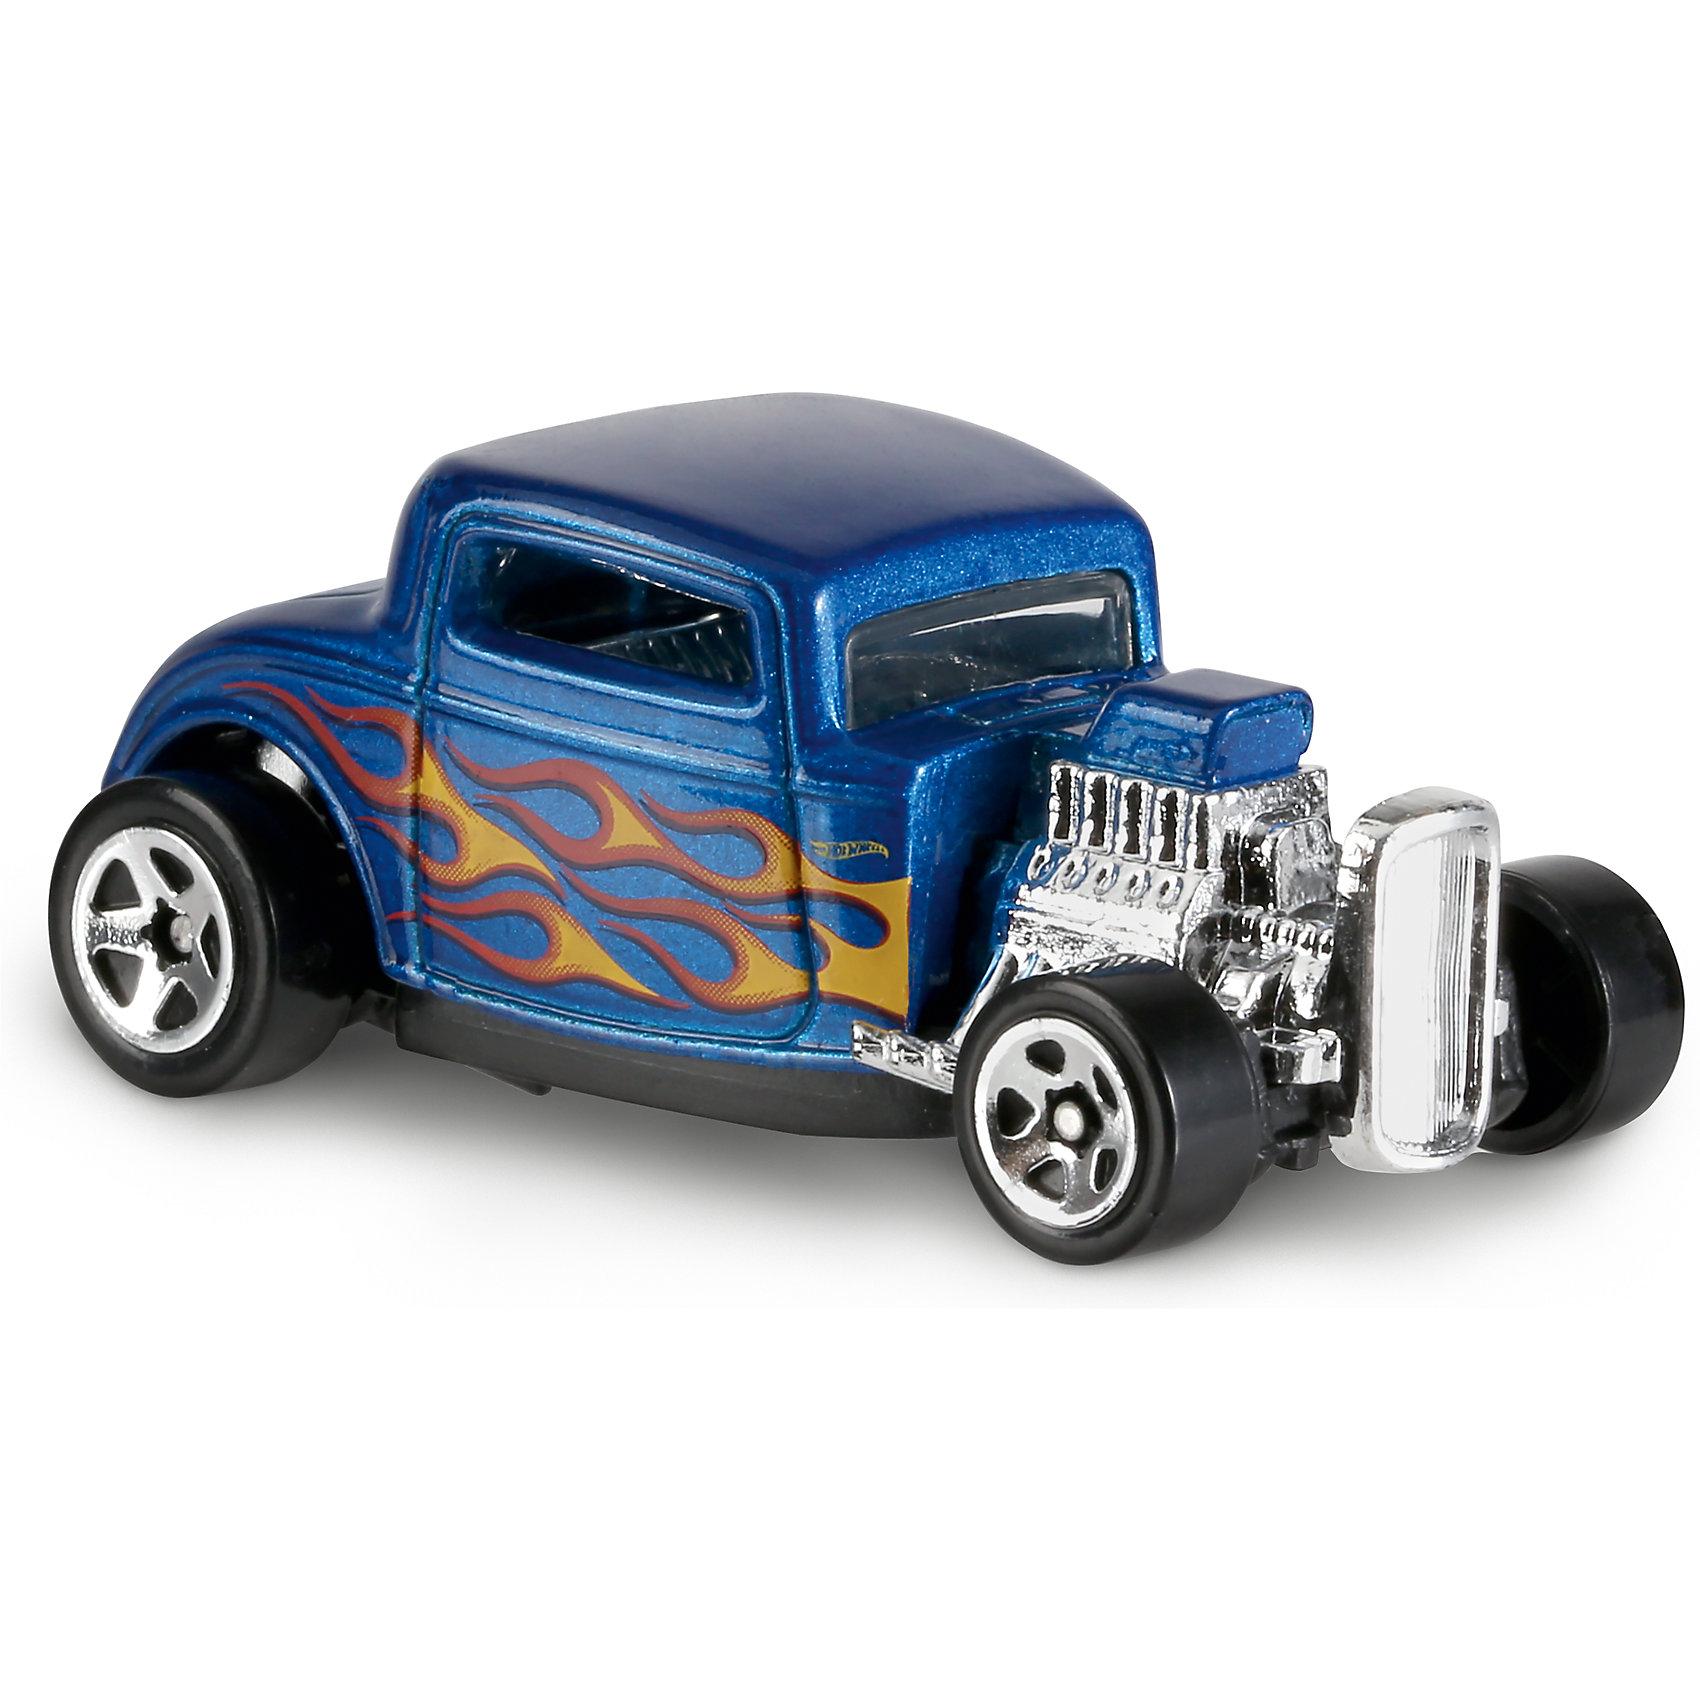 Базовая машинка Hot Wheels, 32 FordМашинки<br><br><br>Ширина мм: 110<br>Глубина мм: 45<br>Высота мм: 110<br>Вес г: 30<br>Возраст от месяцев: 36<br>Возраст до месяцев: 96<br>Пол: Мужской<br>Возраст: Детский<br>SKU: 7111074